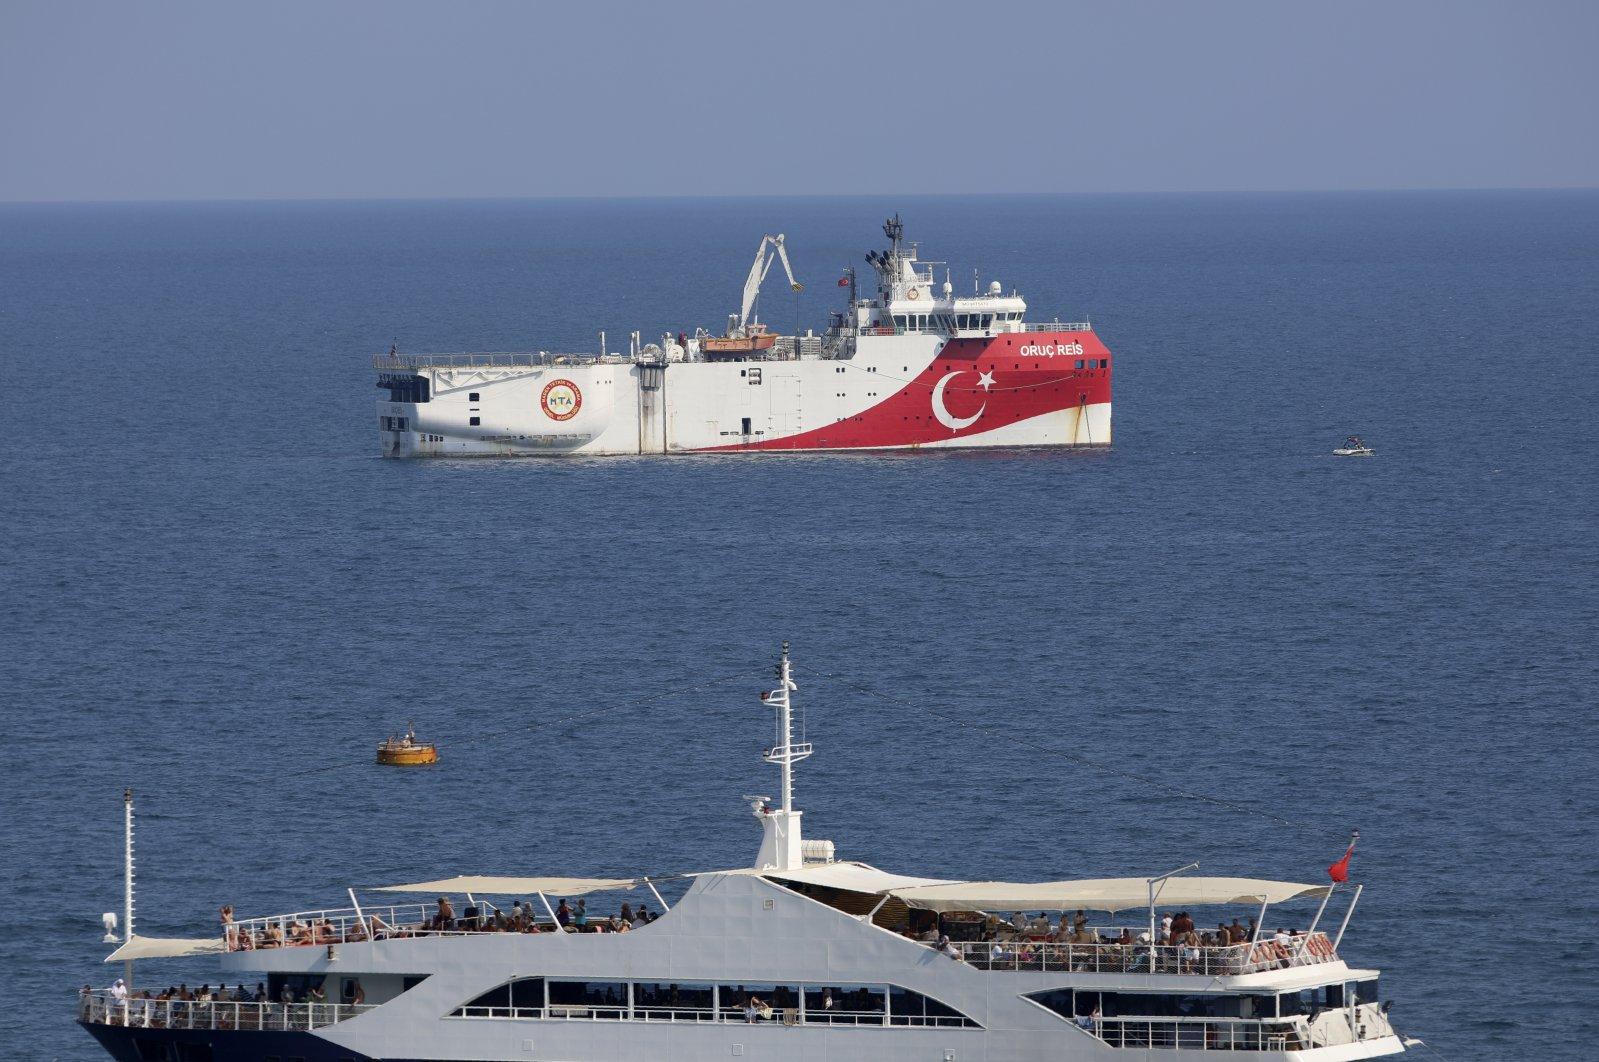 Turkey's research vessel Oruç Reis, rear, anchored off the coast of Antalya, southern Turkey, in the Mediterranean, Sept. 13, 2020. (AP Photo)